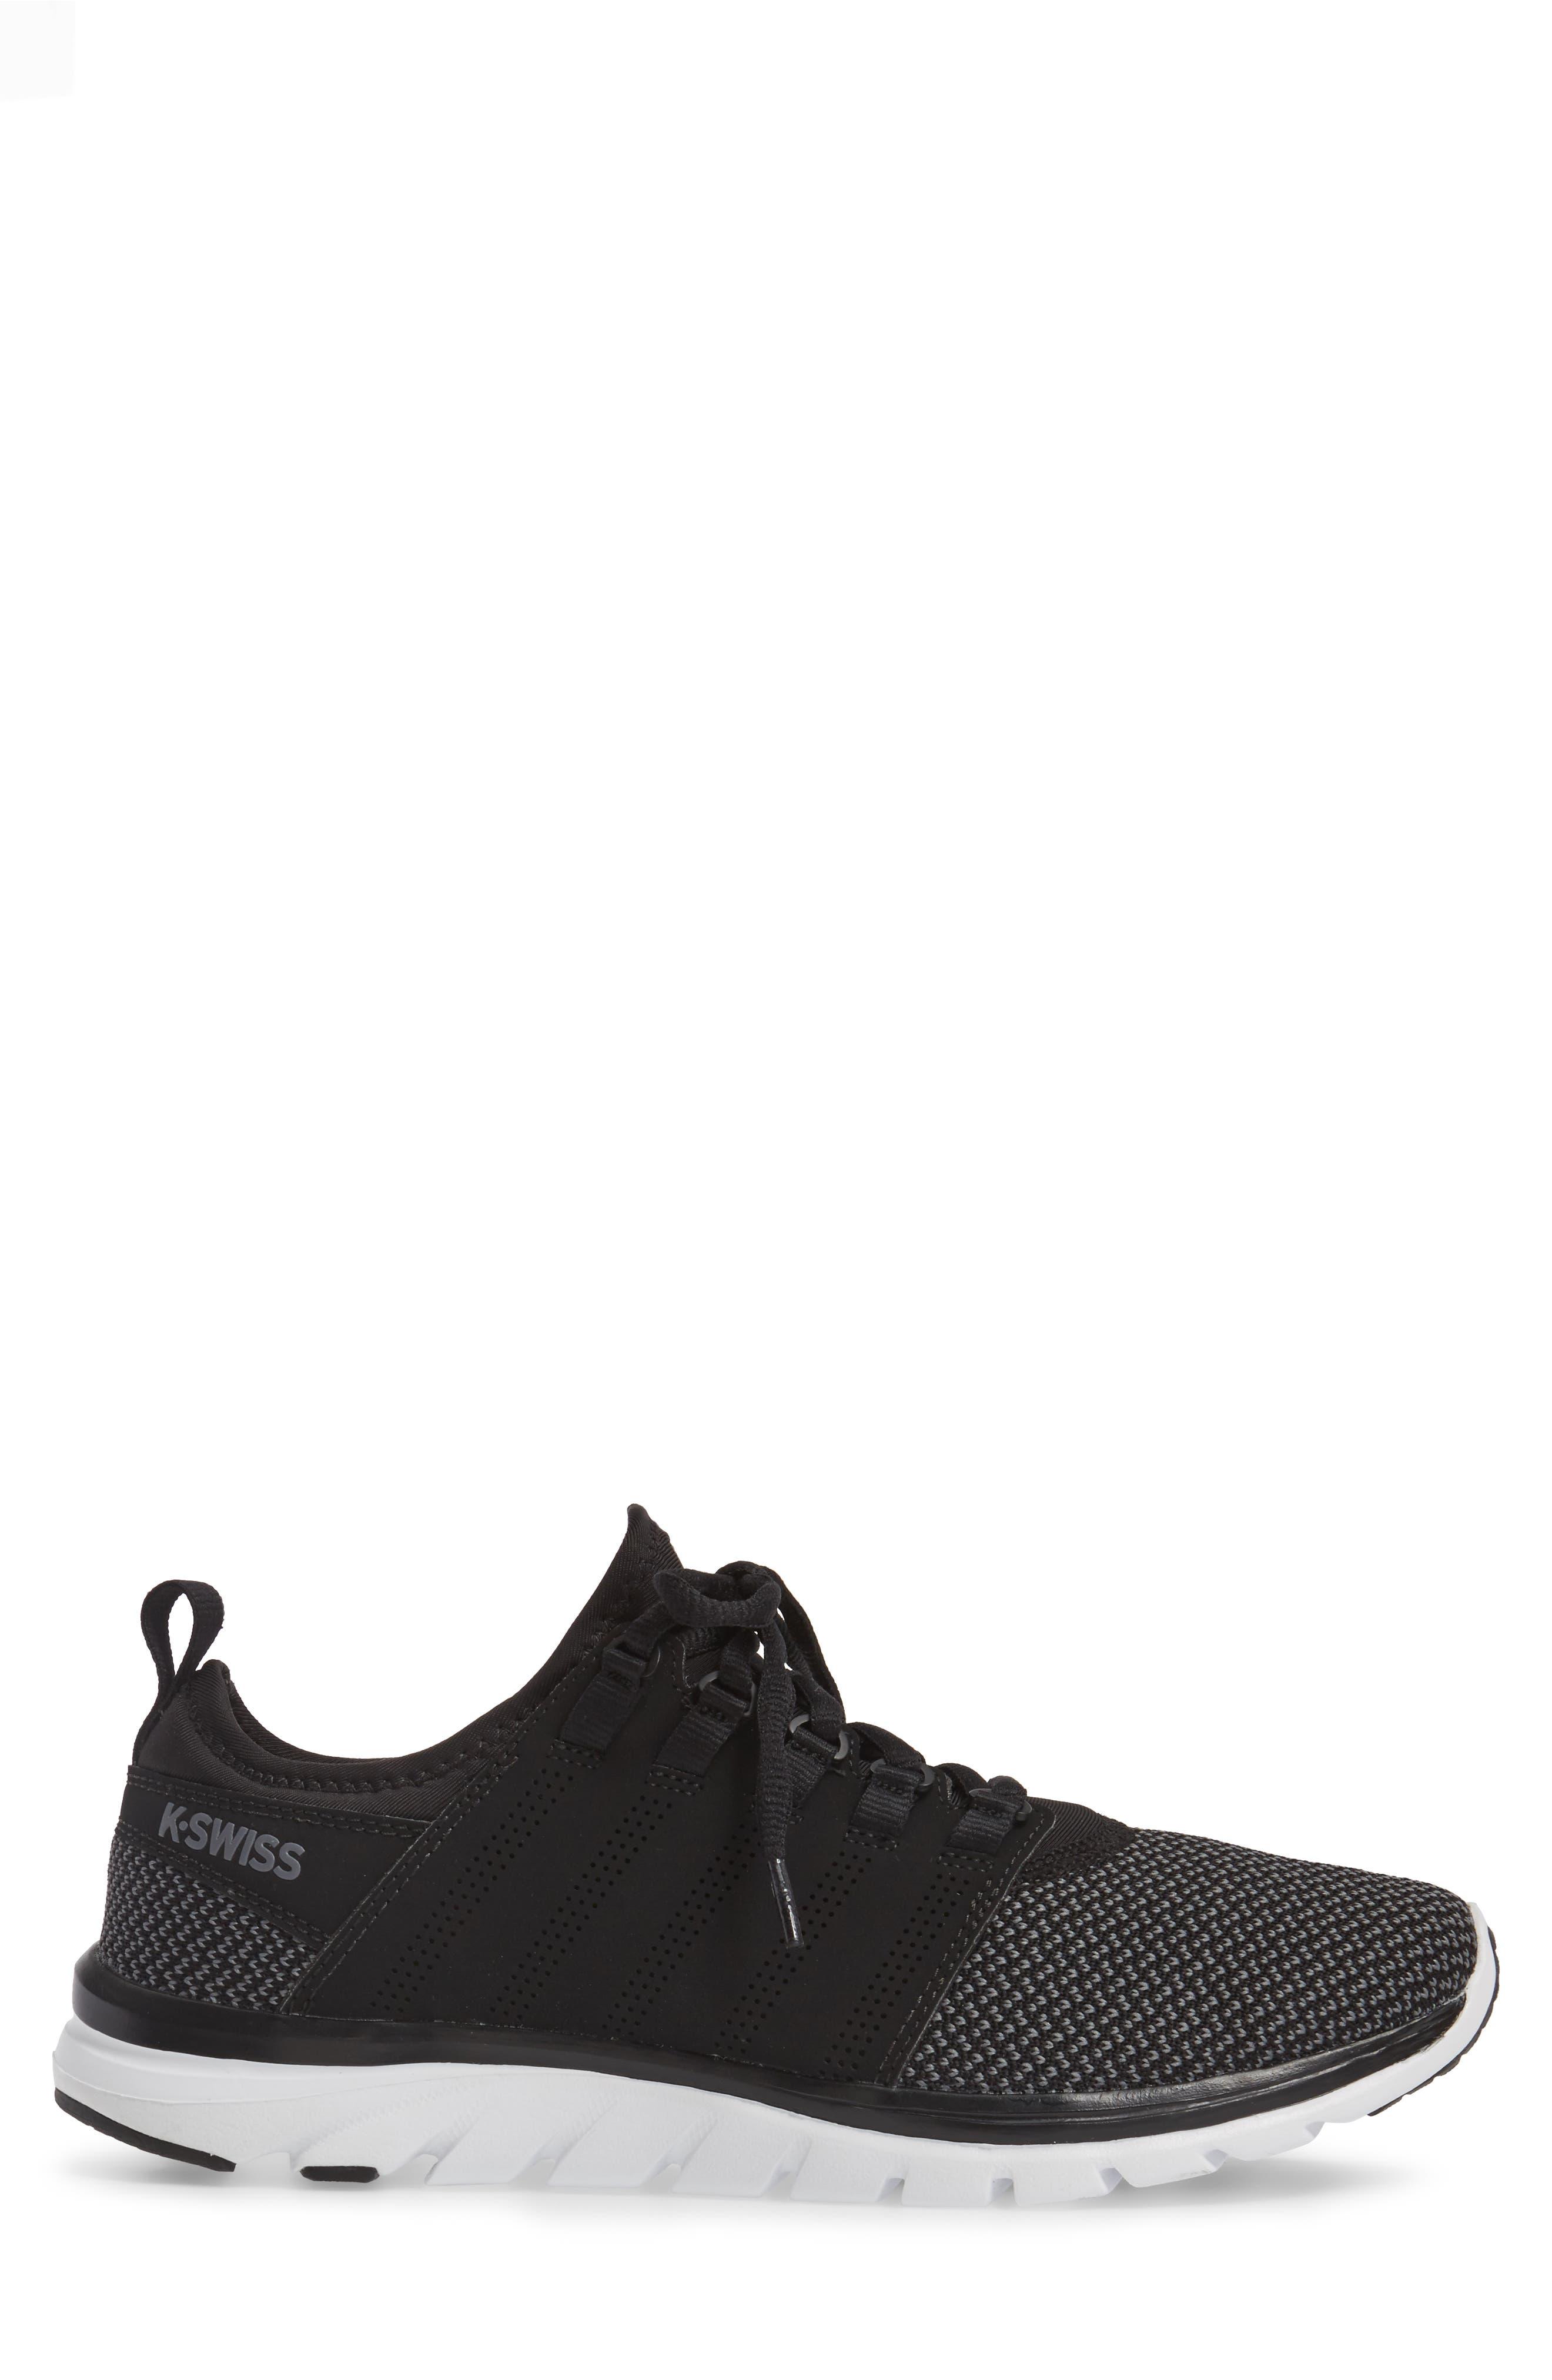 Alternate Image 3  - K-Swiss Ace Trainer CMF Sneaker (Men)